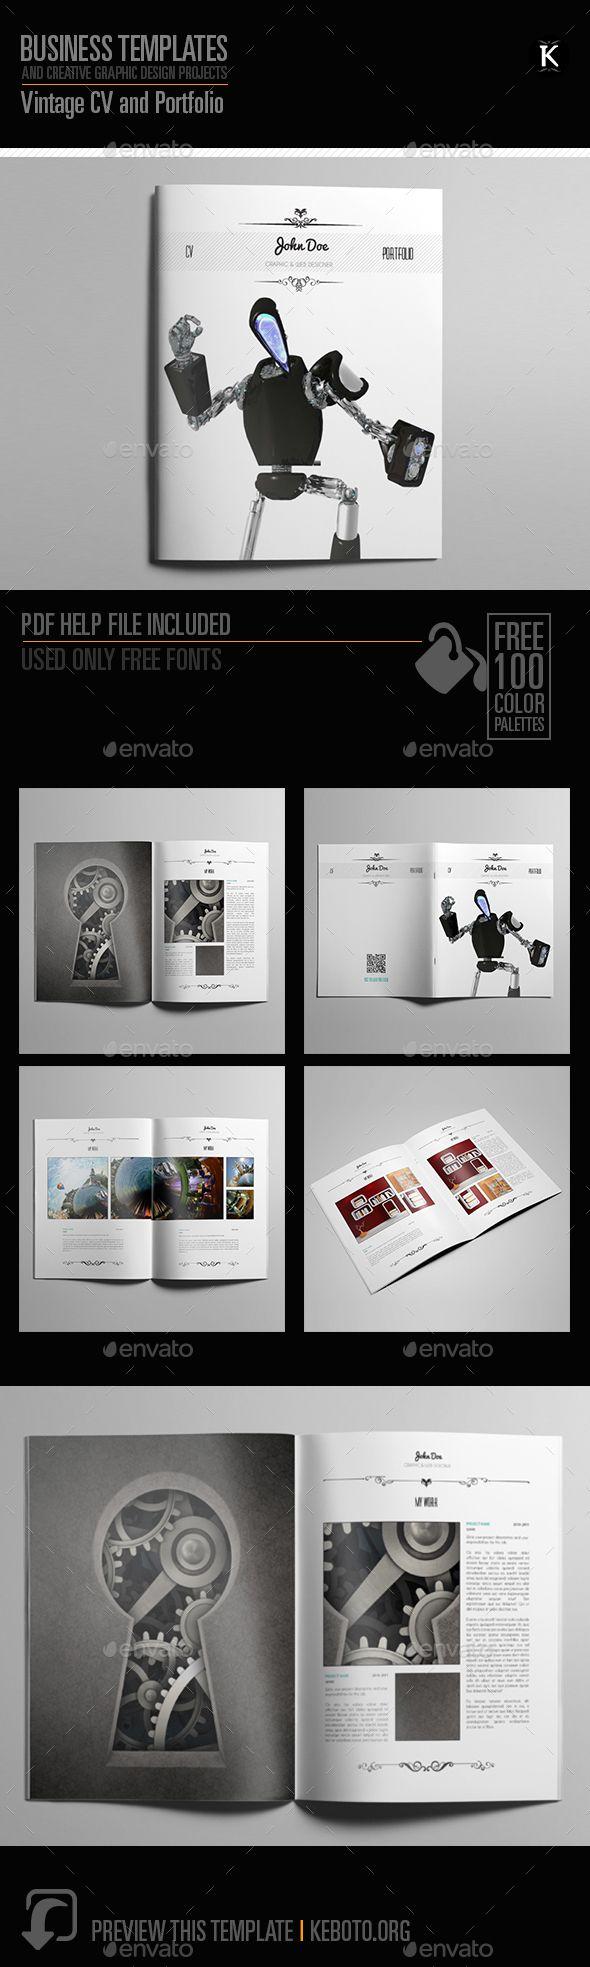 Vintage CV and Portfolio   Adobe indesign, Adobe and Simple resume ...